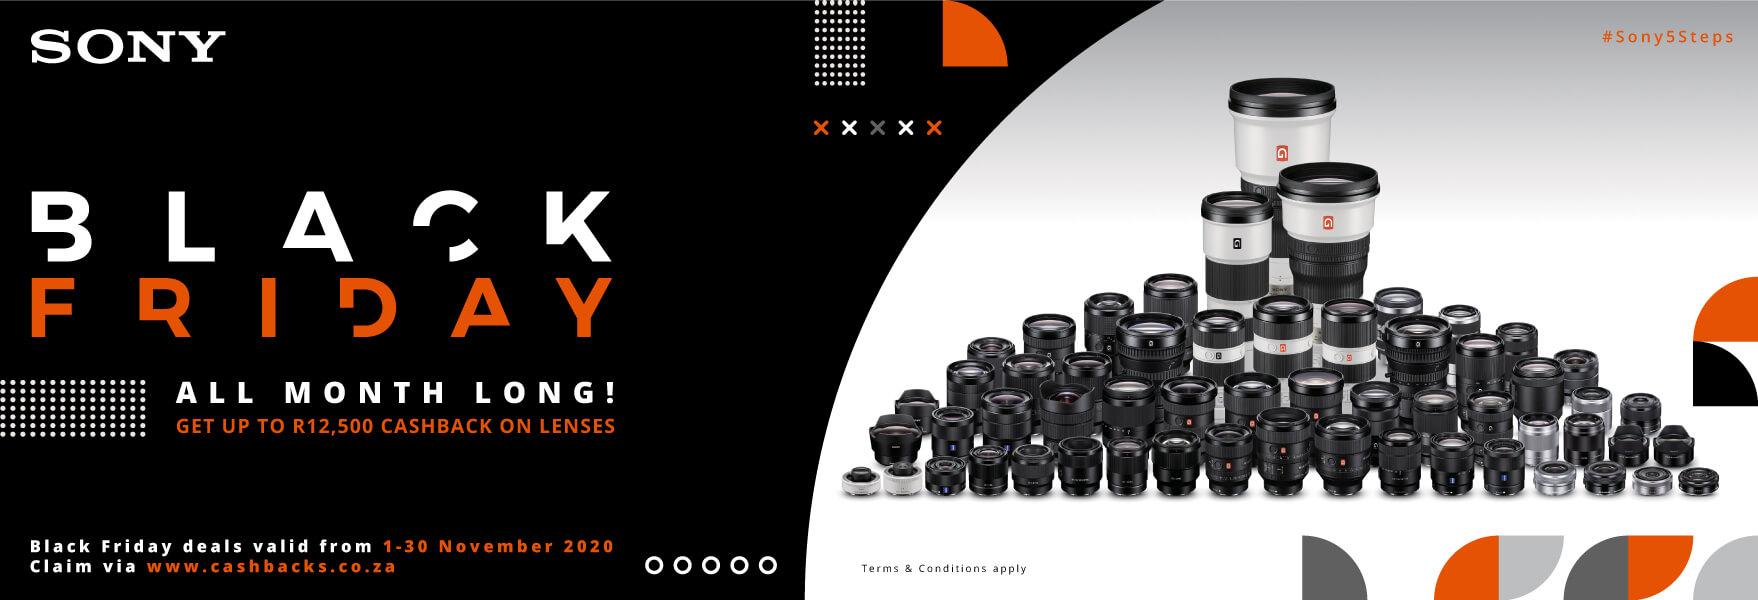 Photo Freedom-Sony Black Friday